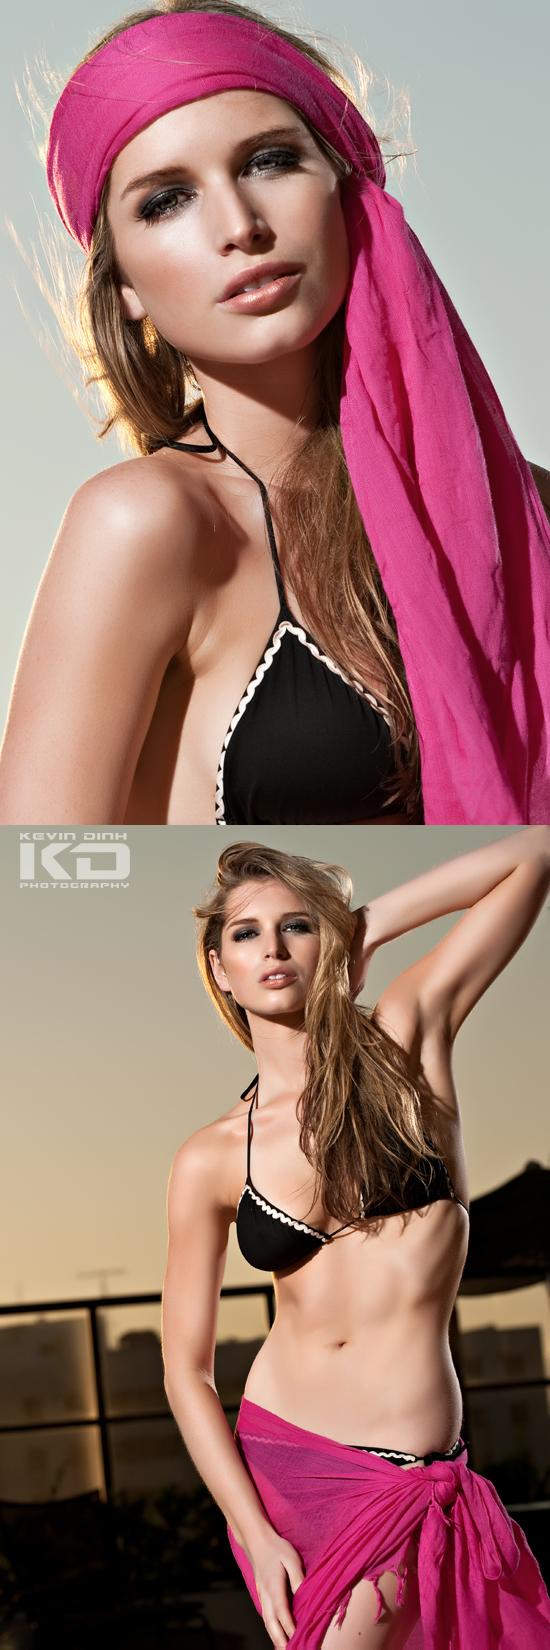 Oct 29, 2009 Kevin Dinh Design 2009 Makeup & hair by Nica. Model: Madeleine